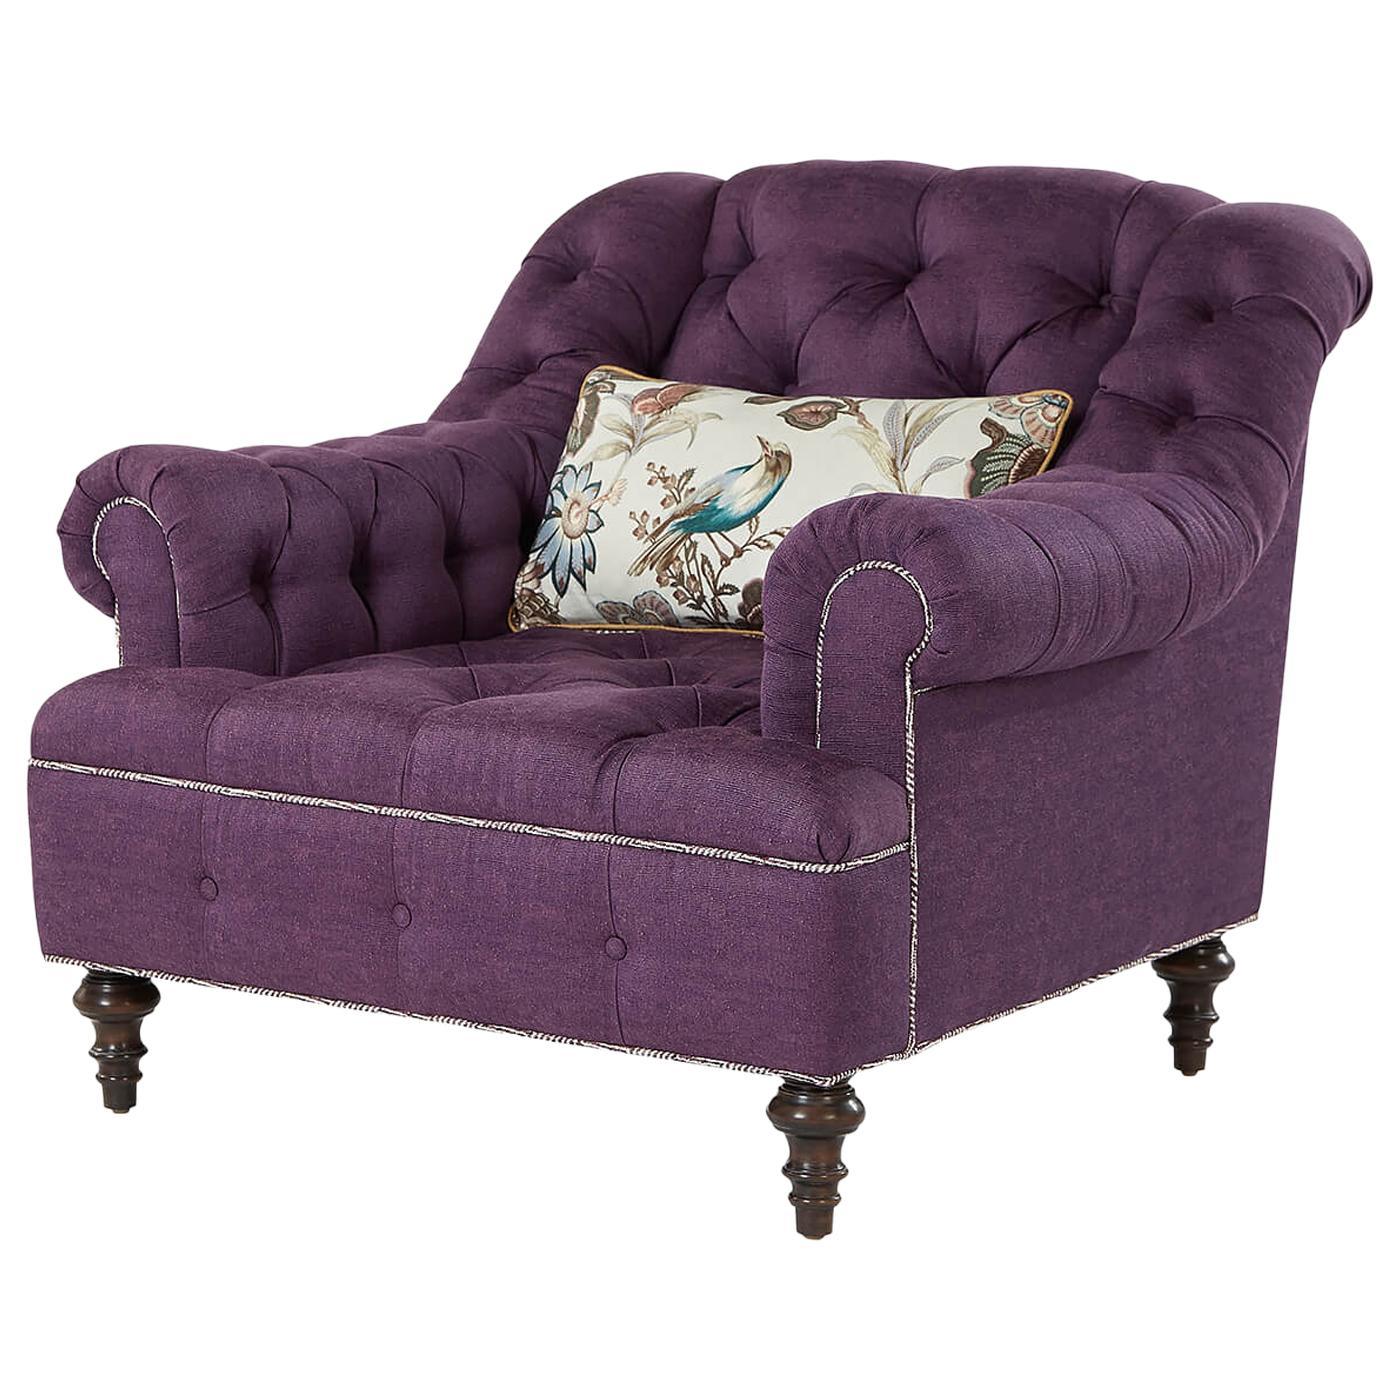 English Classic Tufted Club Chair